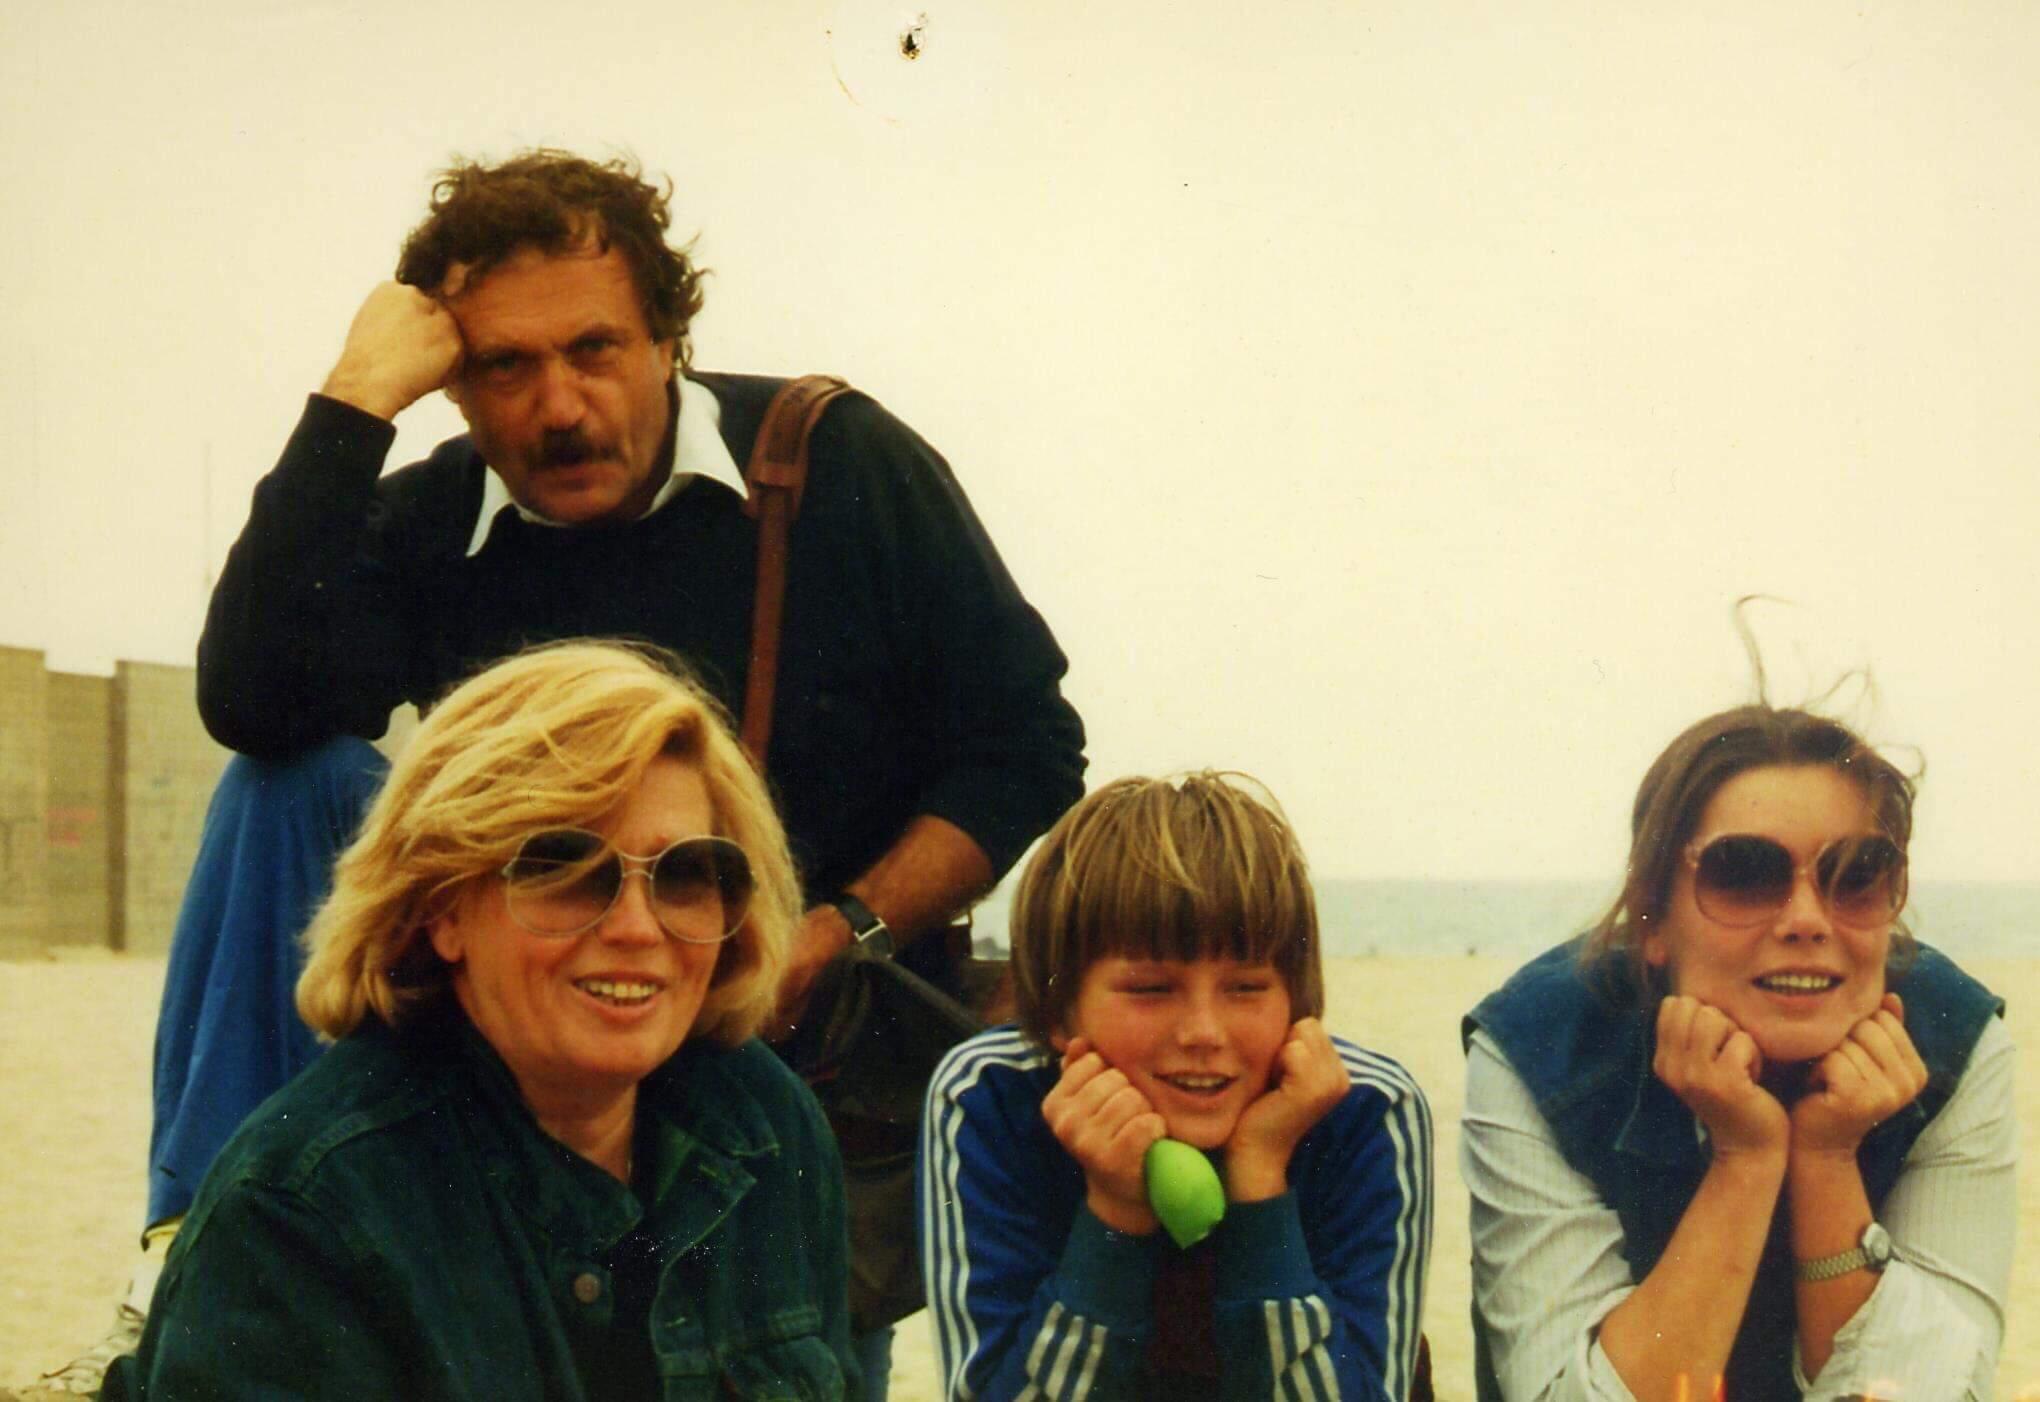 семья василия аксенова фото атлантическом